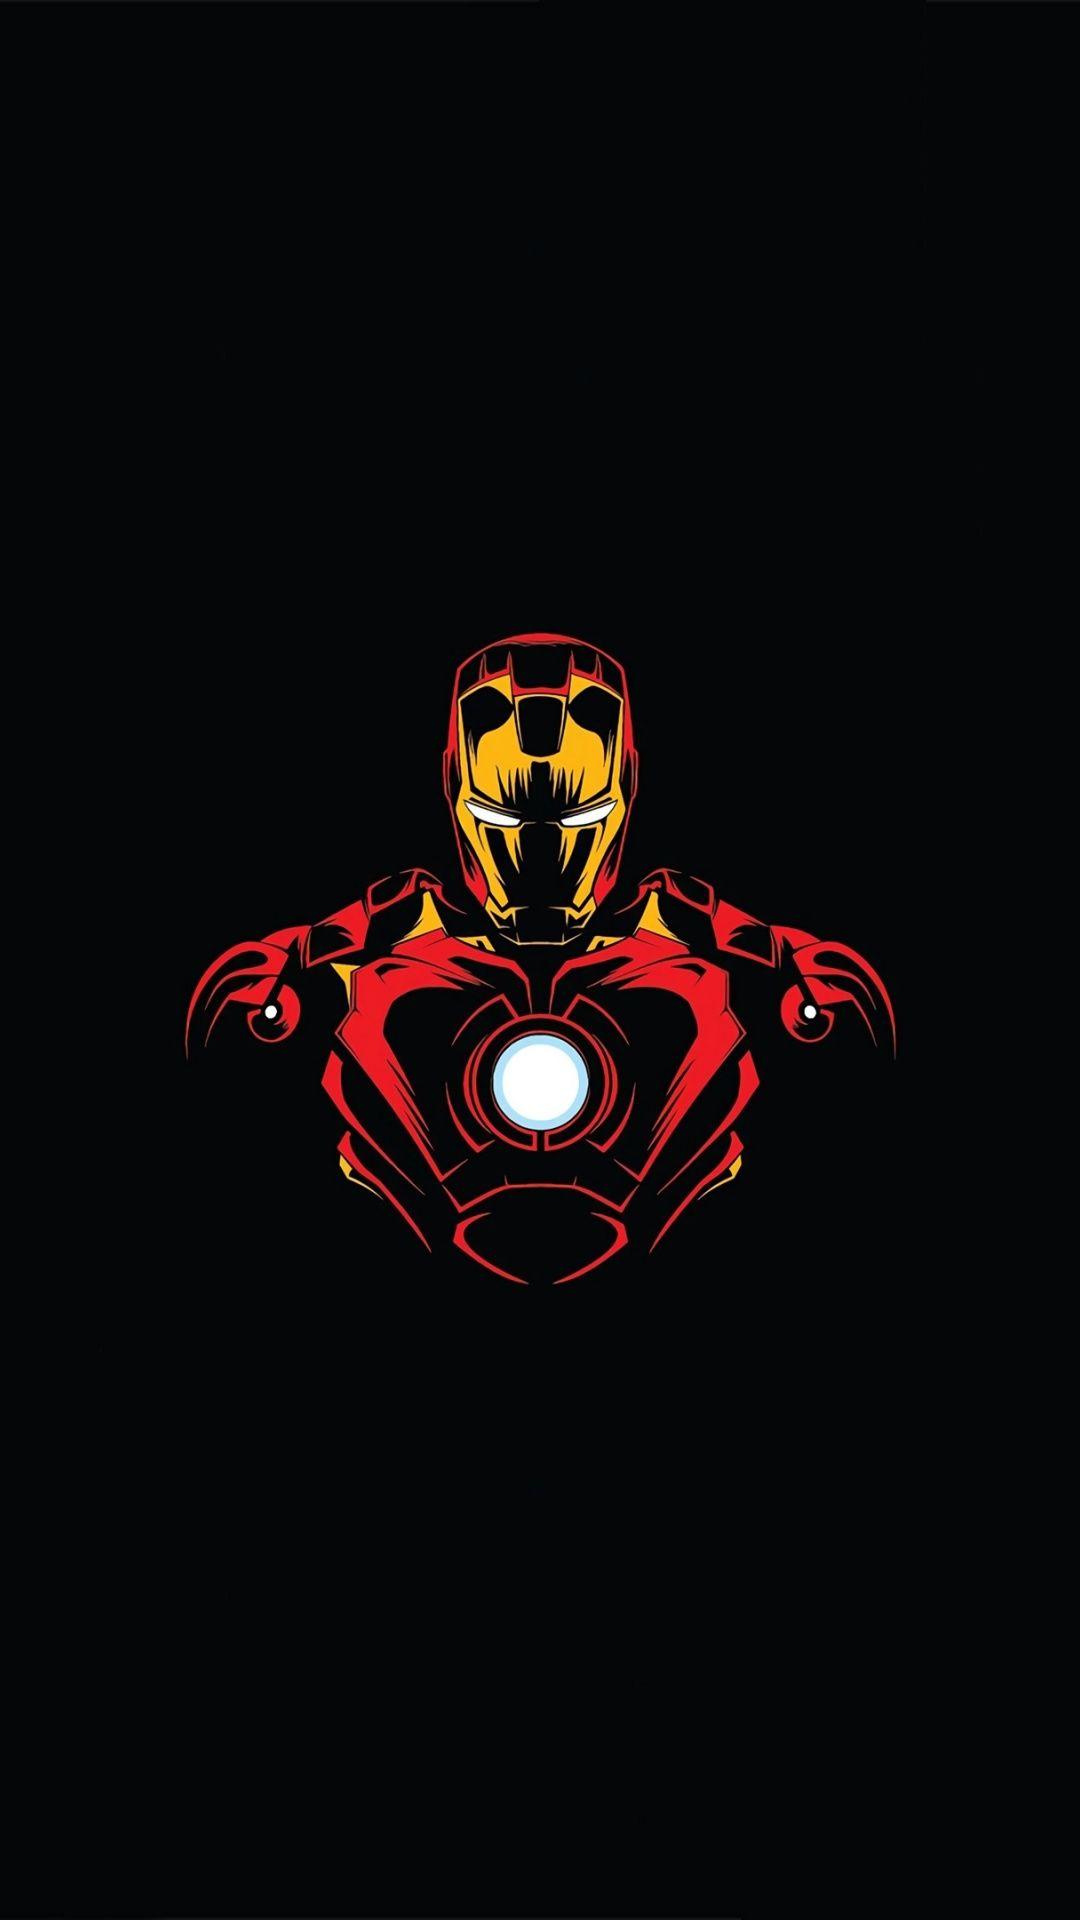 Download 1080x1920 Wallpaper Marvel Hero Iron Man Minimalist Samsung Galaxy S4 S5 Note Sony Xpe Iron Man Art Iron Man Hd Wallpaper Marvel Phone Wallpaper